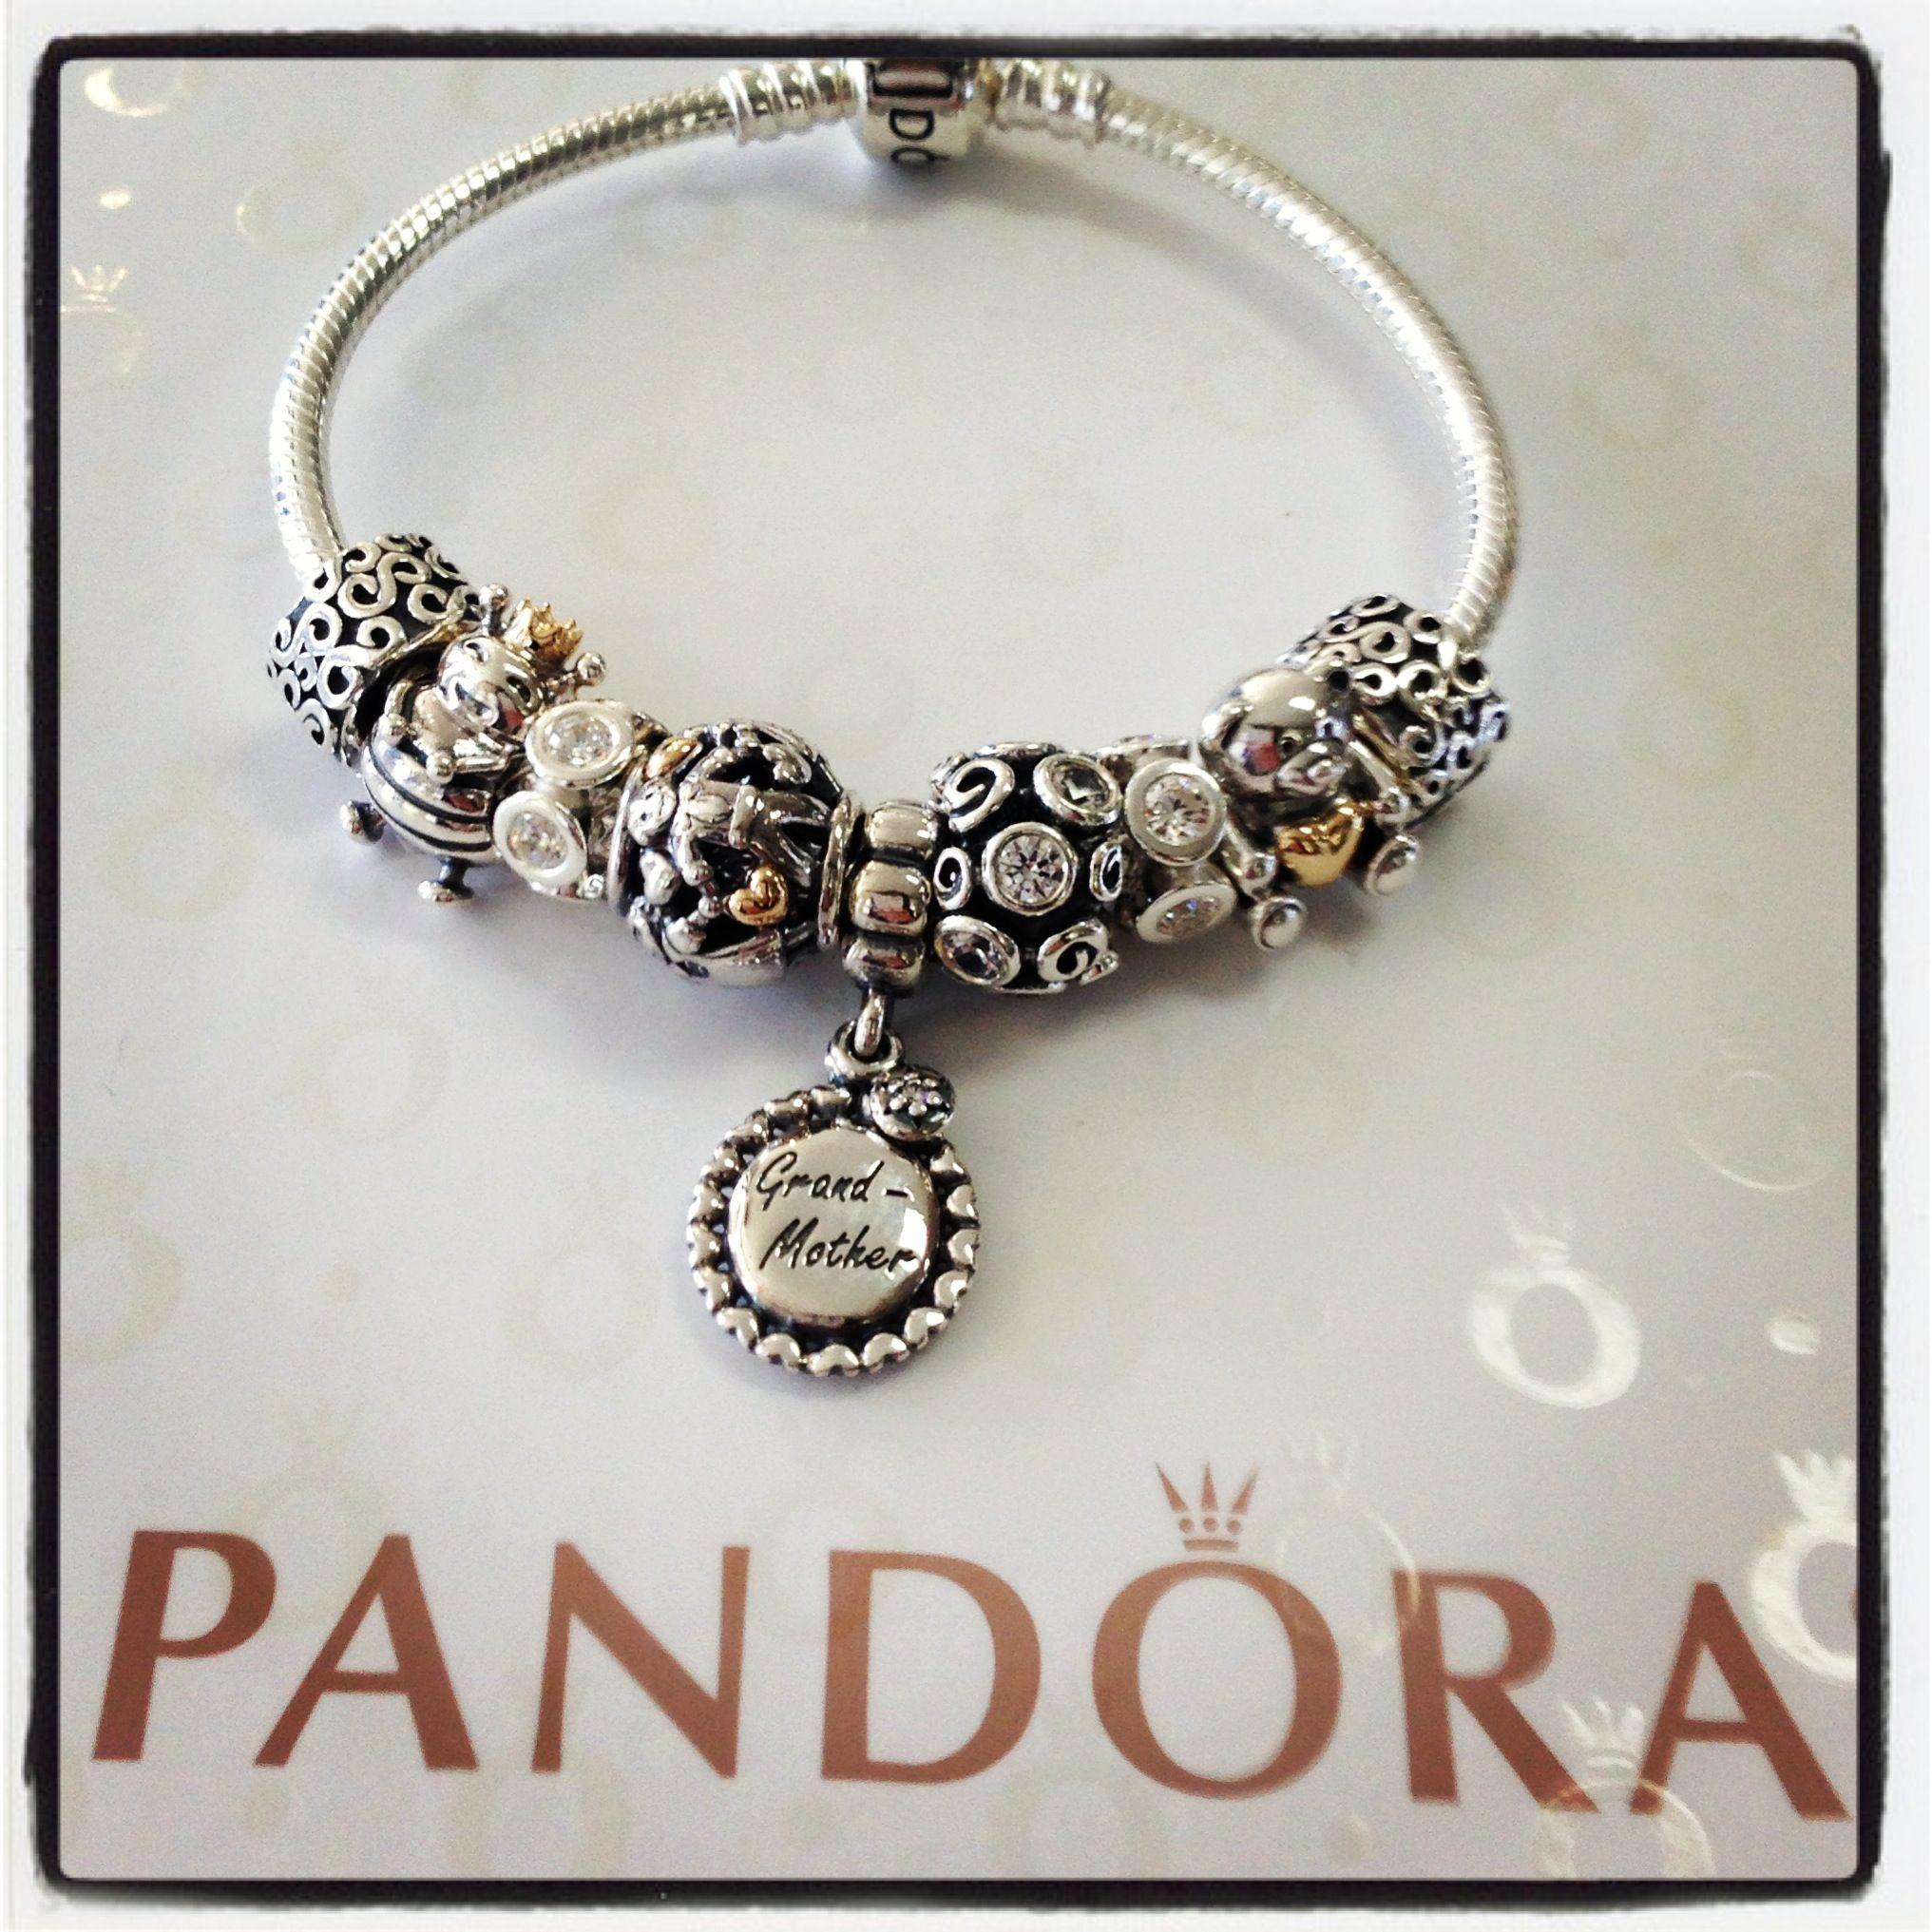 Ultimate Pandora grandmother bracelet Pandora